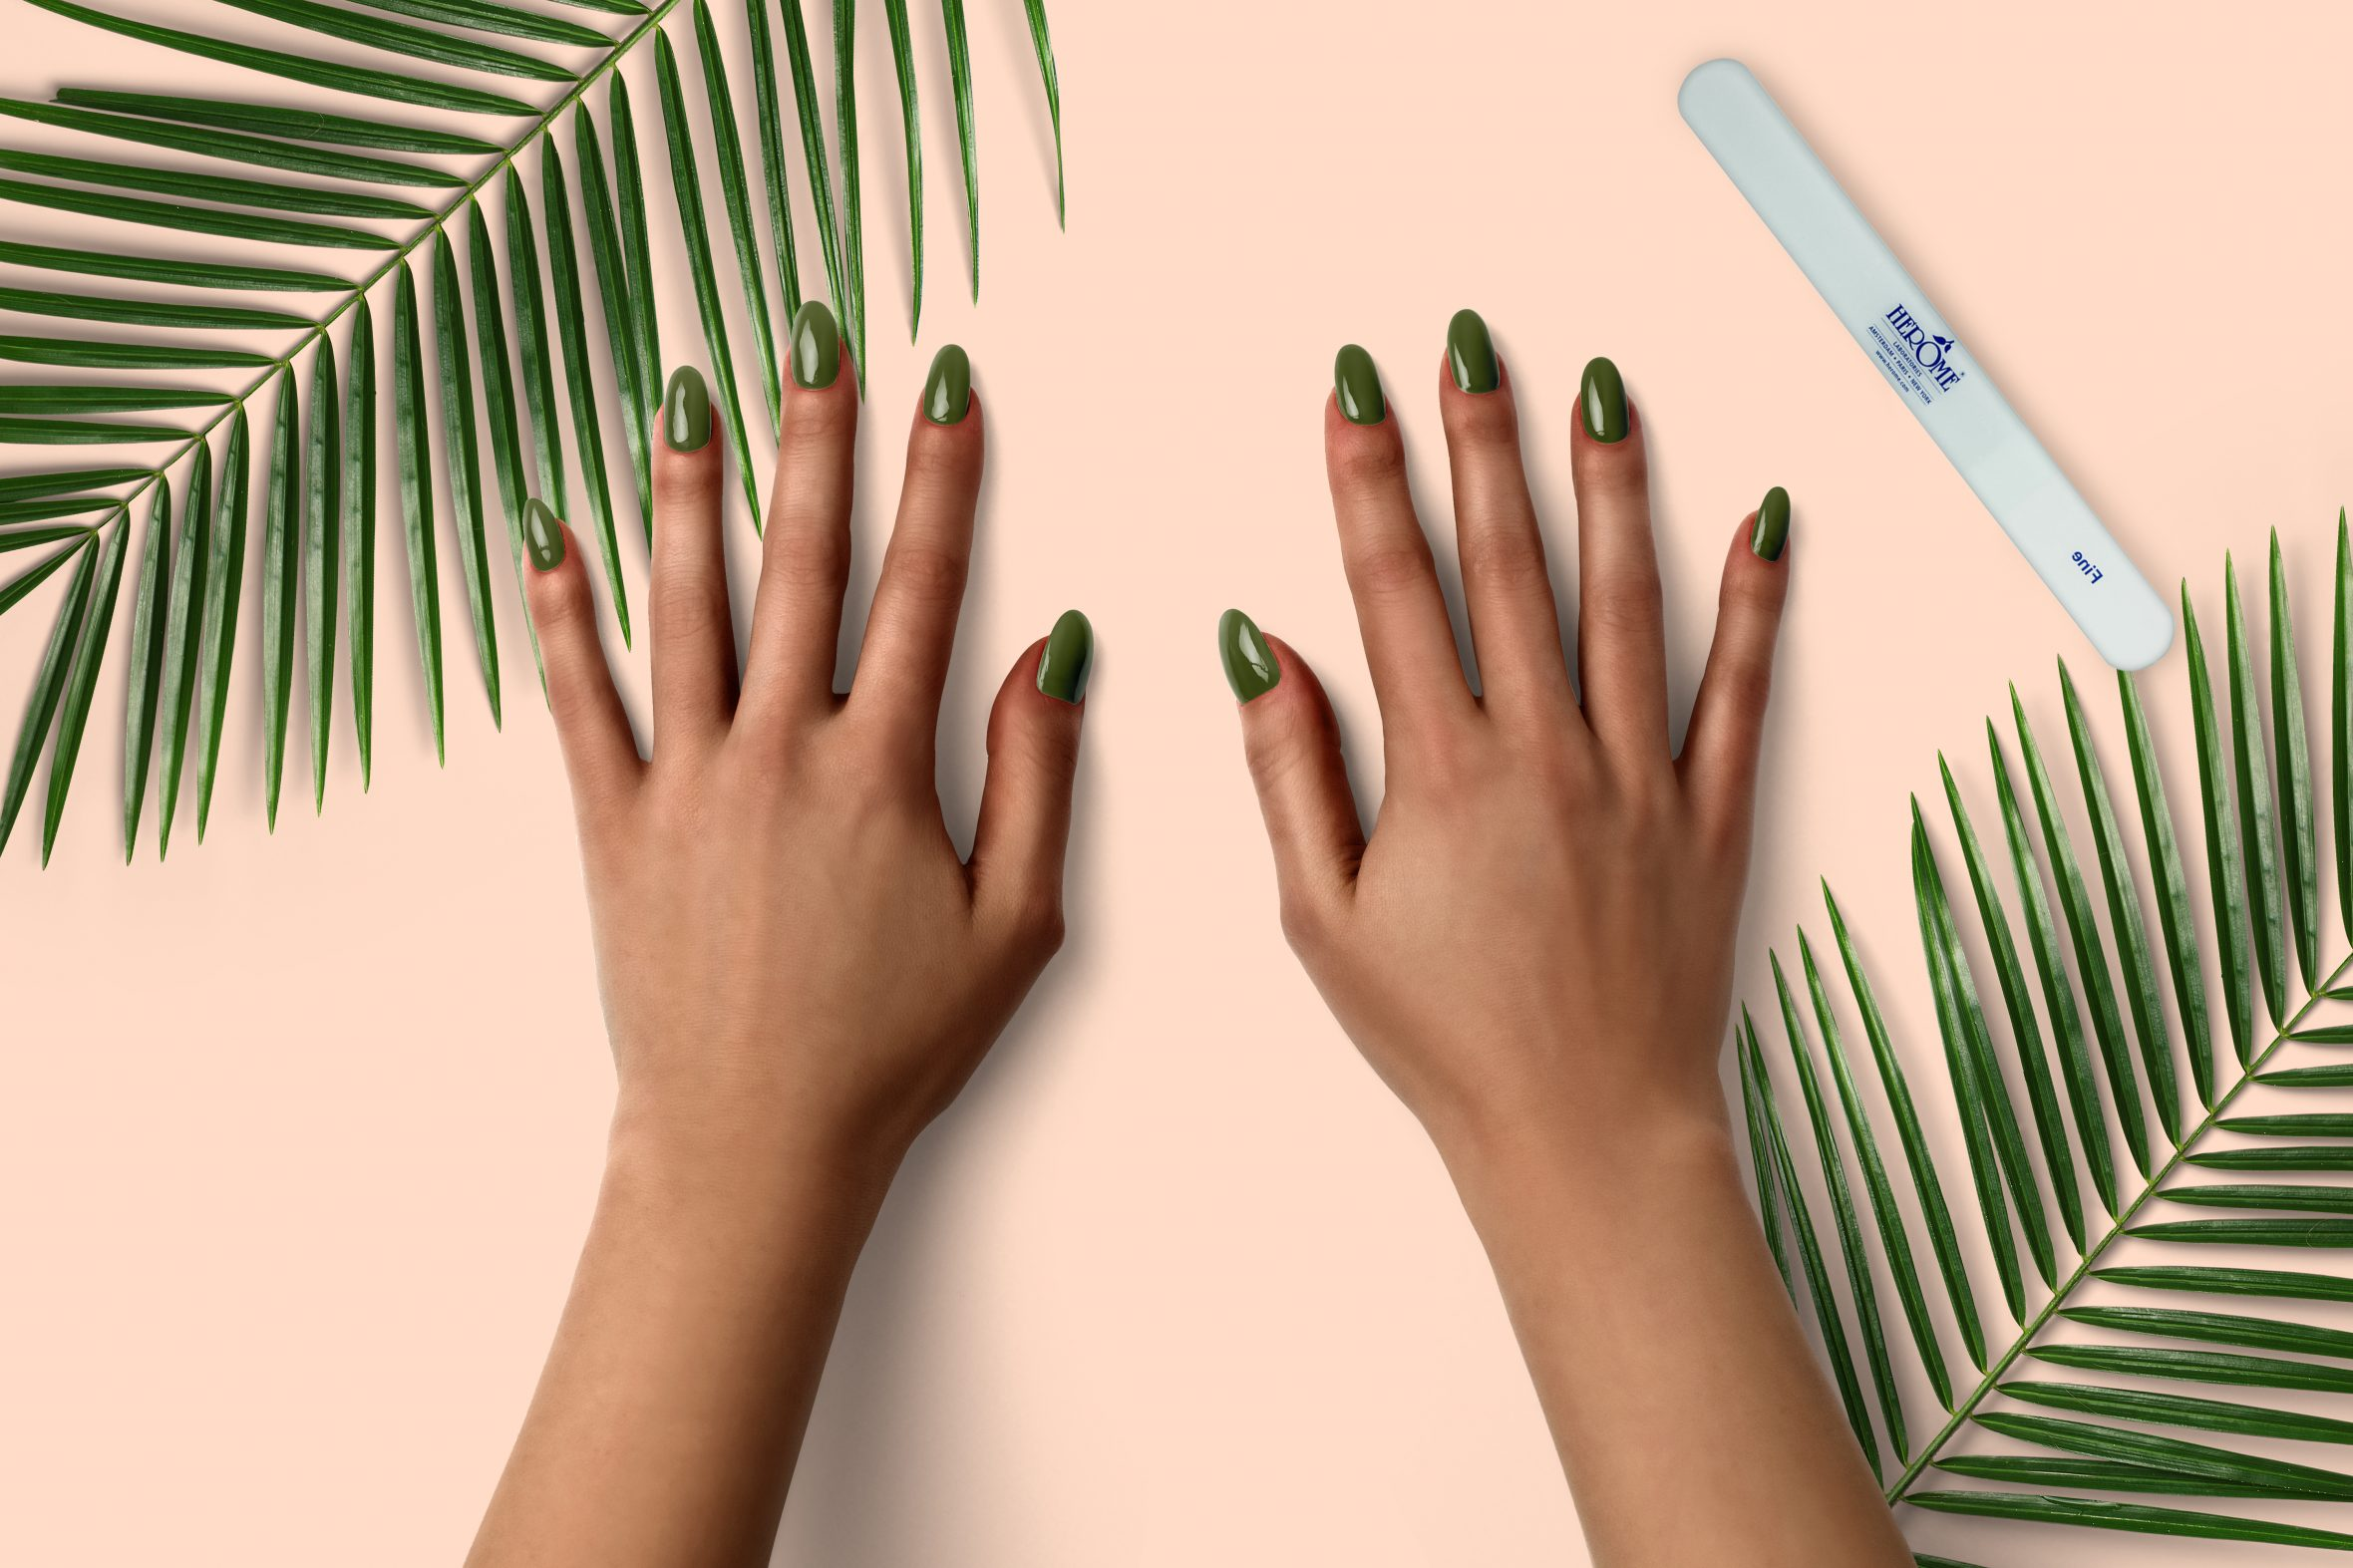 Metallic groene nagellak op je nagels